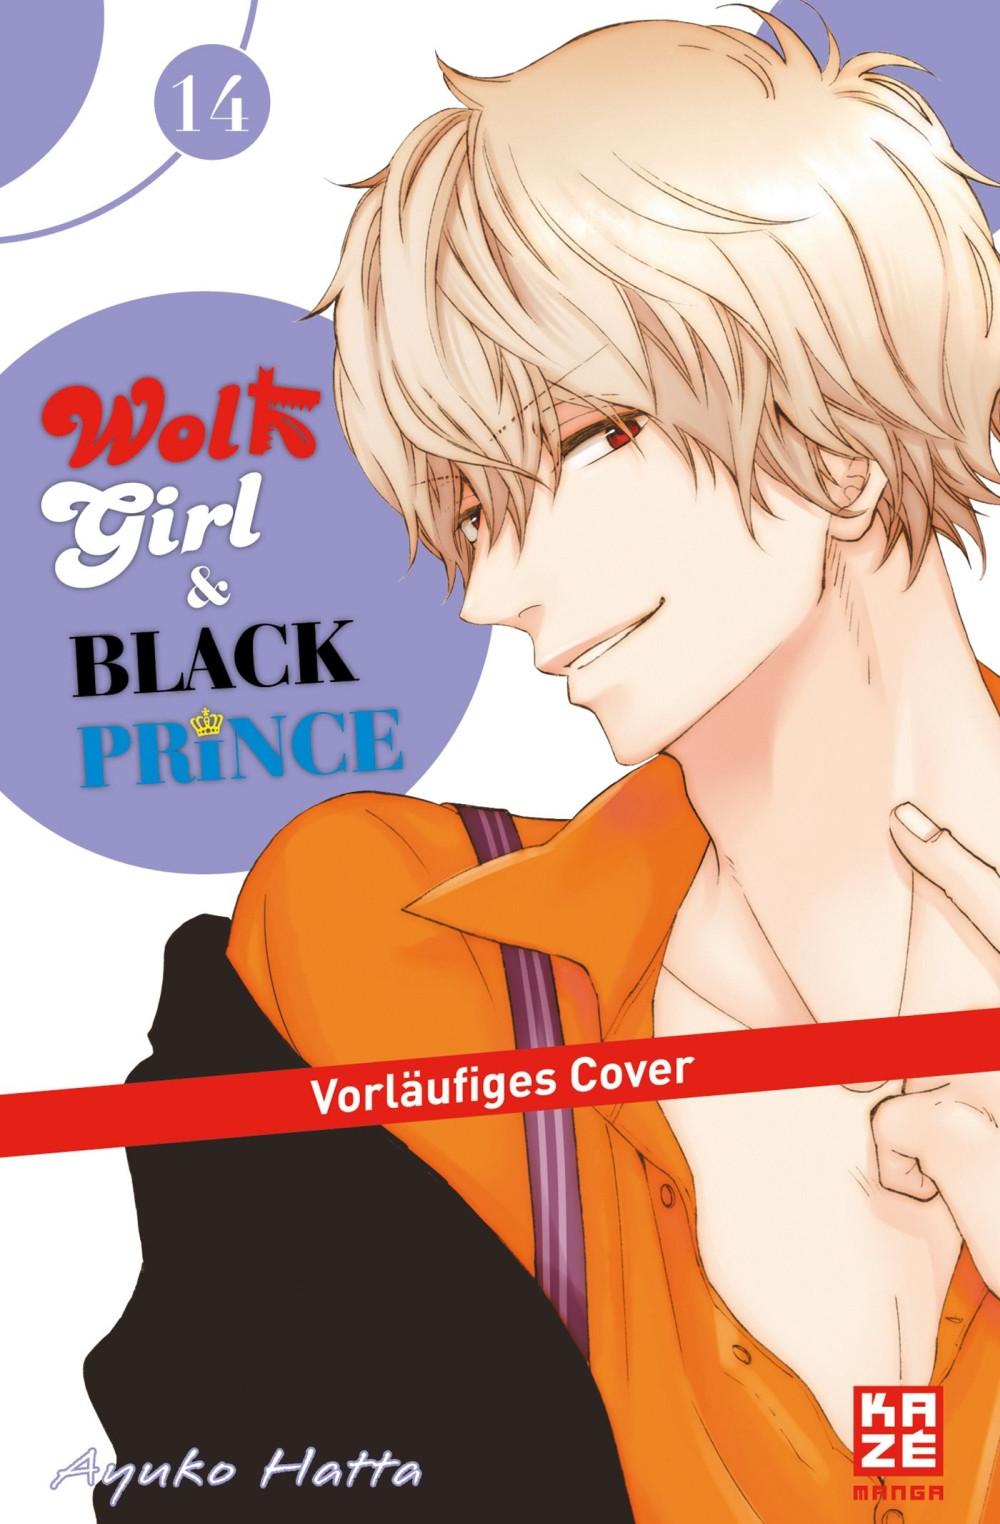 Manga Mafiade Wolf Girl Black Prince 14 Manga